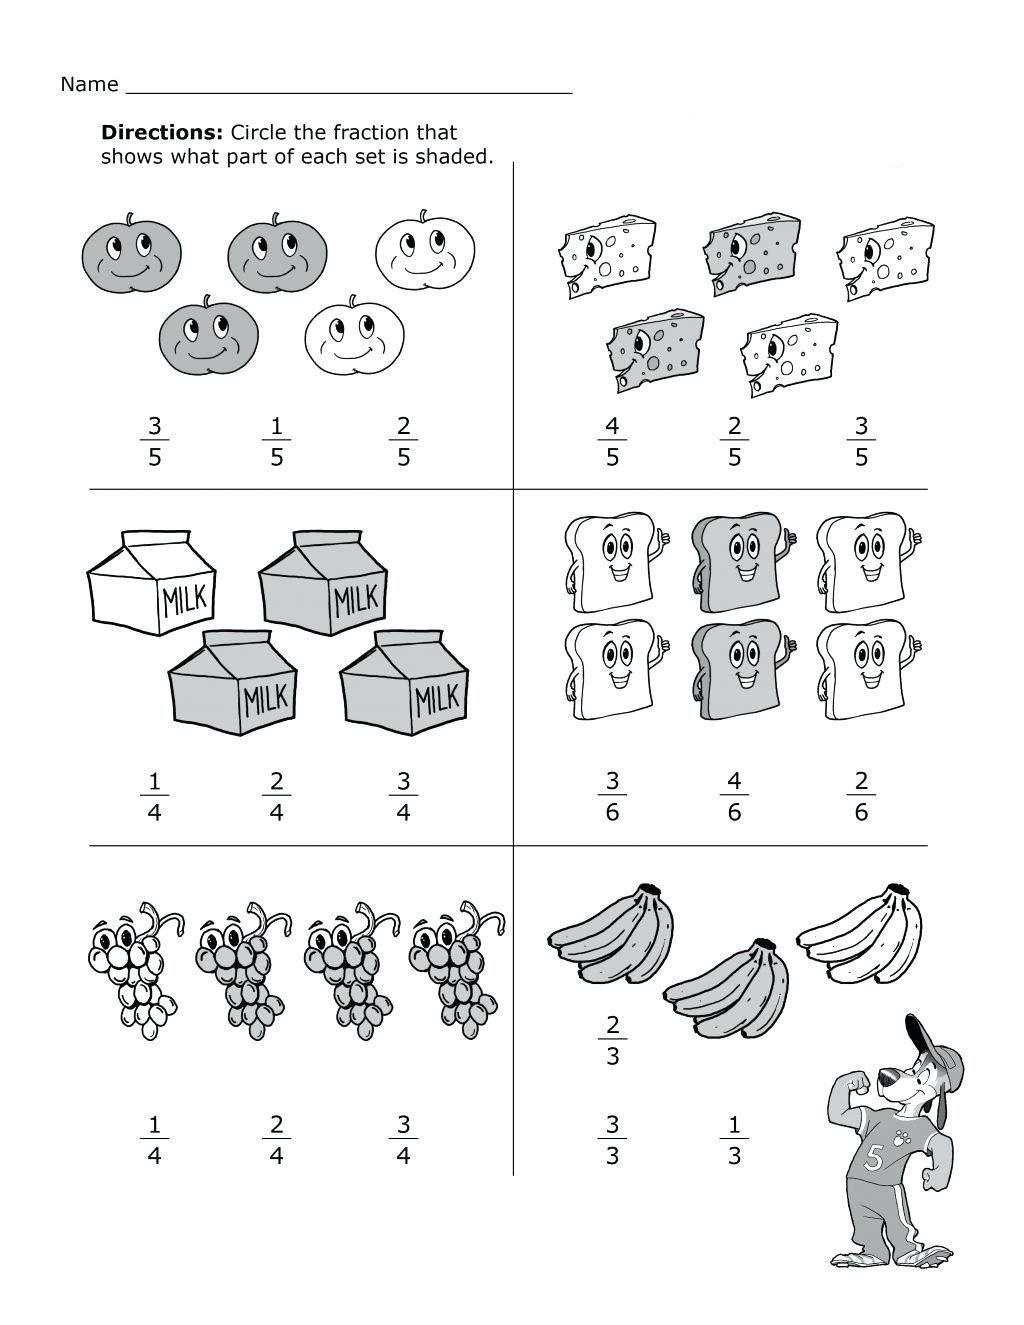 hight resolution of 2nd Grade Fraction Worksheets 2nd Grade Math Worksheets Best Coloring Pages  for Kids   Fractions worksheets